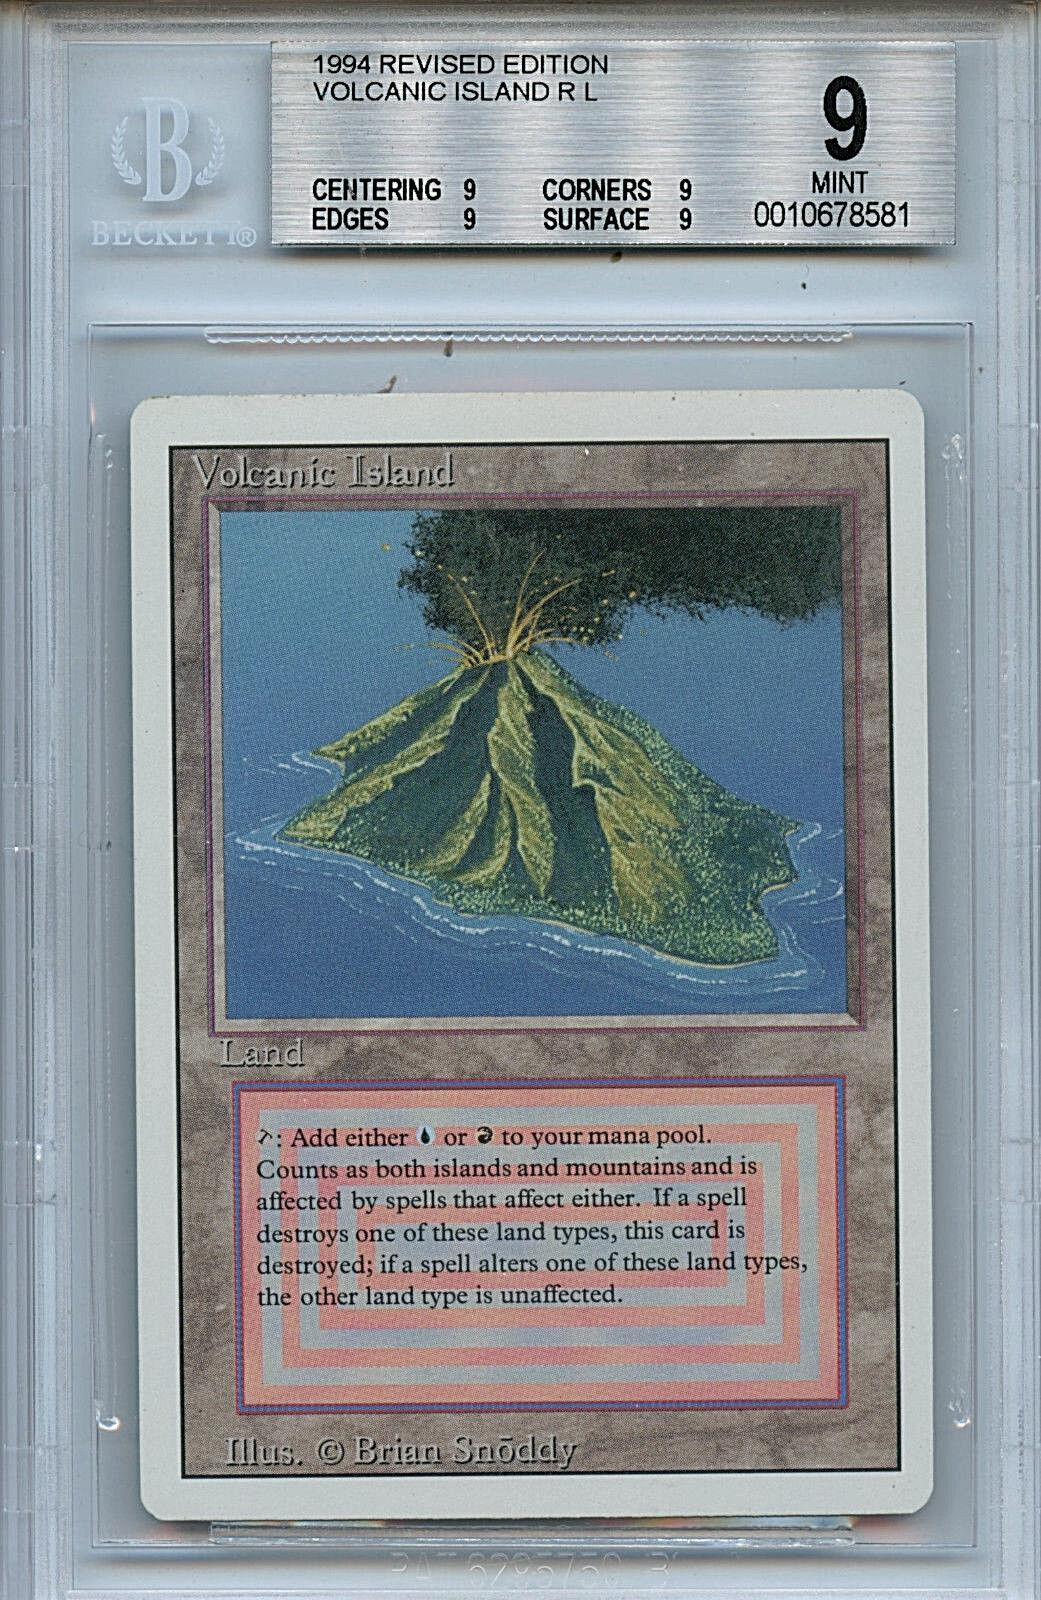 MTG Revised Dual Land Volcanic Island BGS 9.0 (9) Mint Magic Card Quad 9's 8581